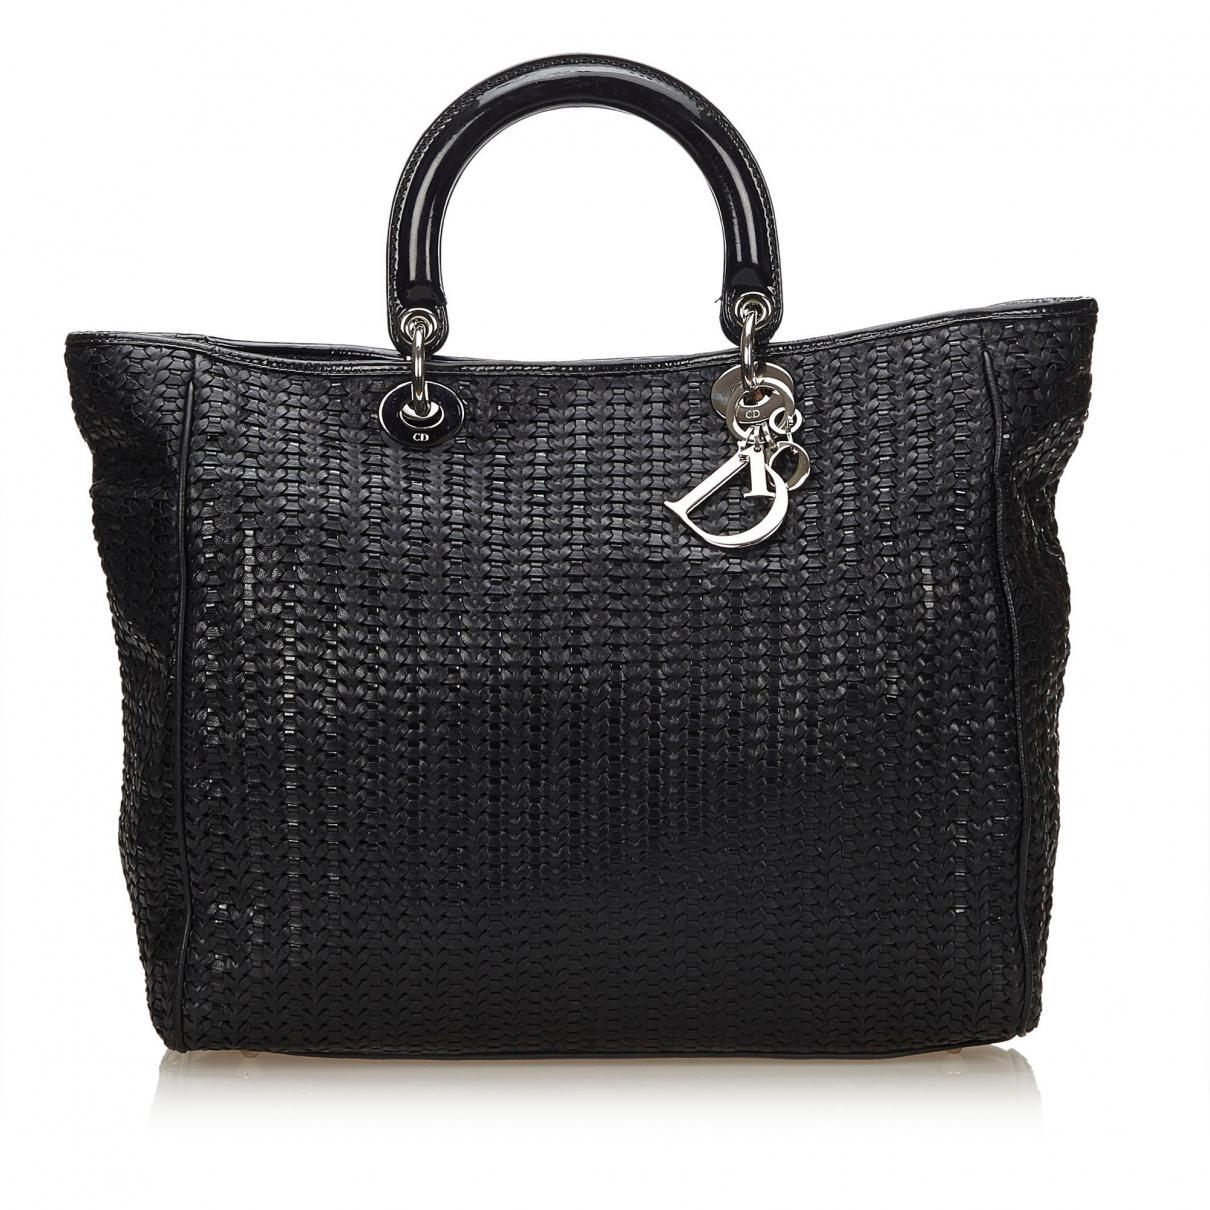 Dior Pre-owned - CABAS BAG oXrq1